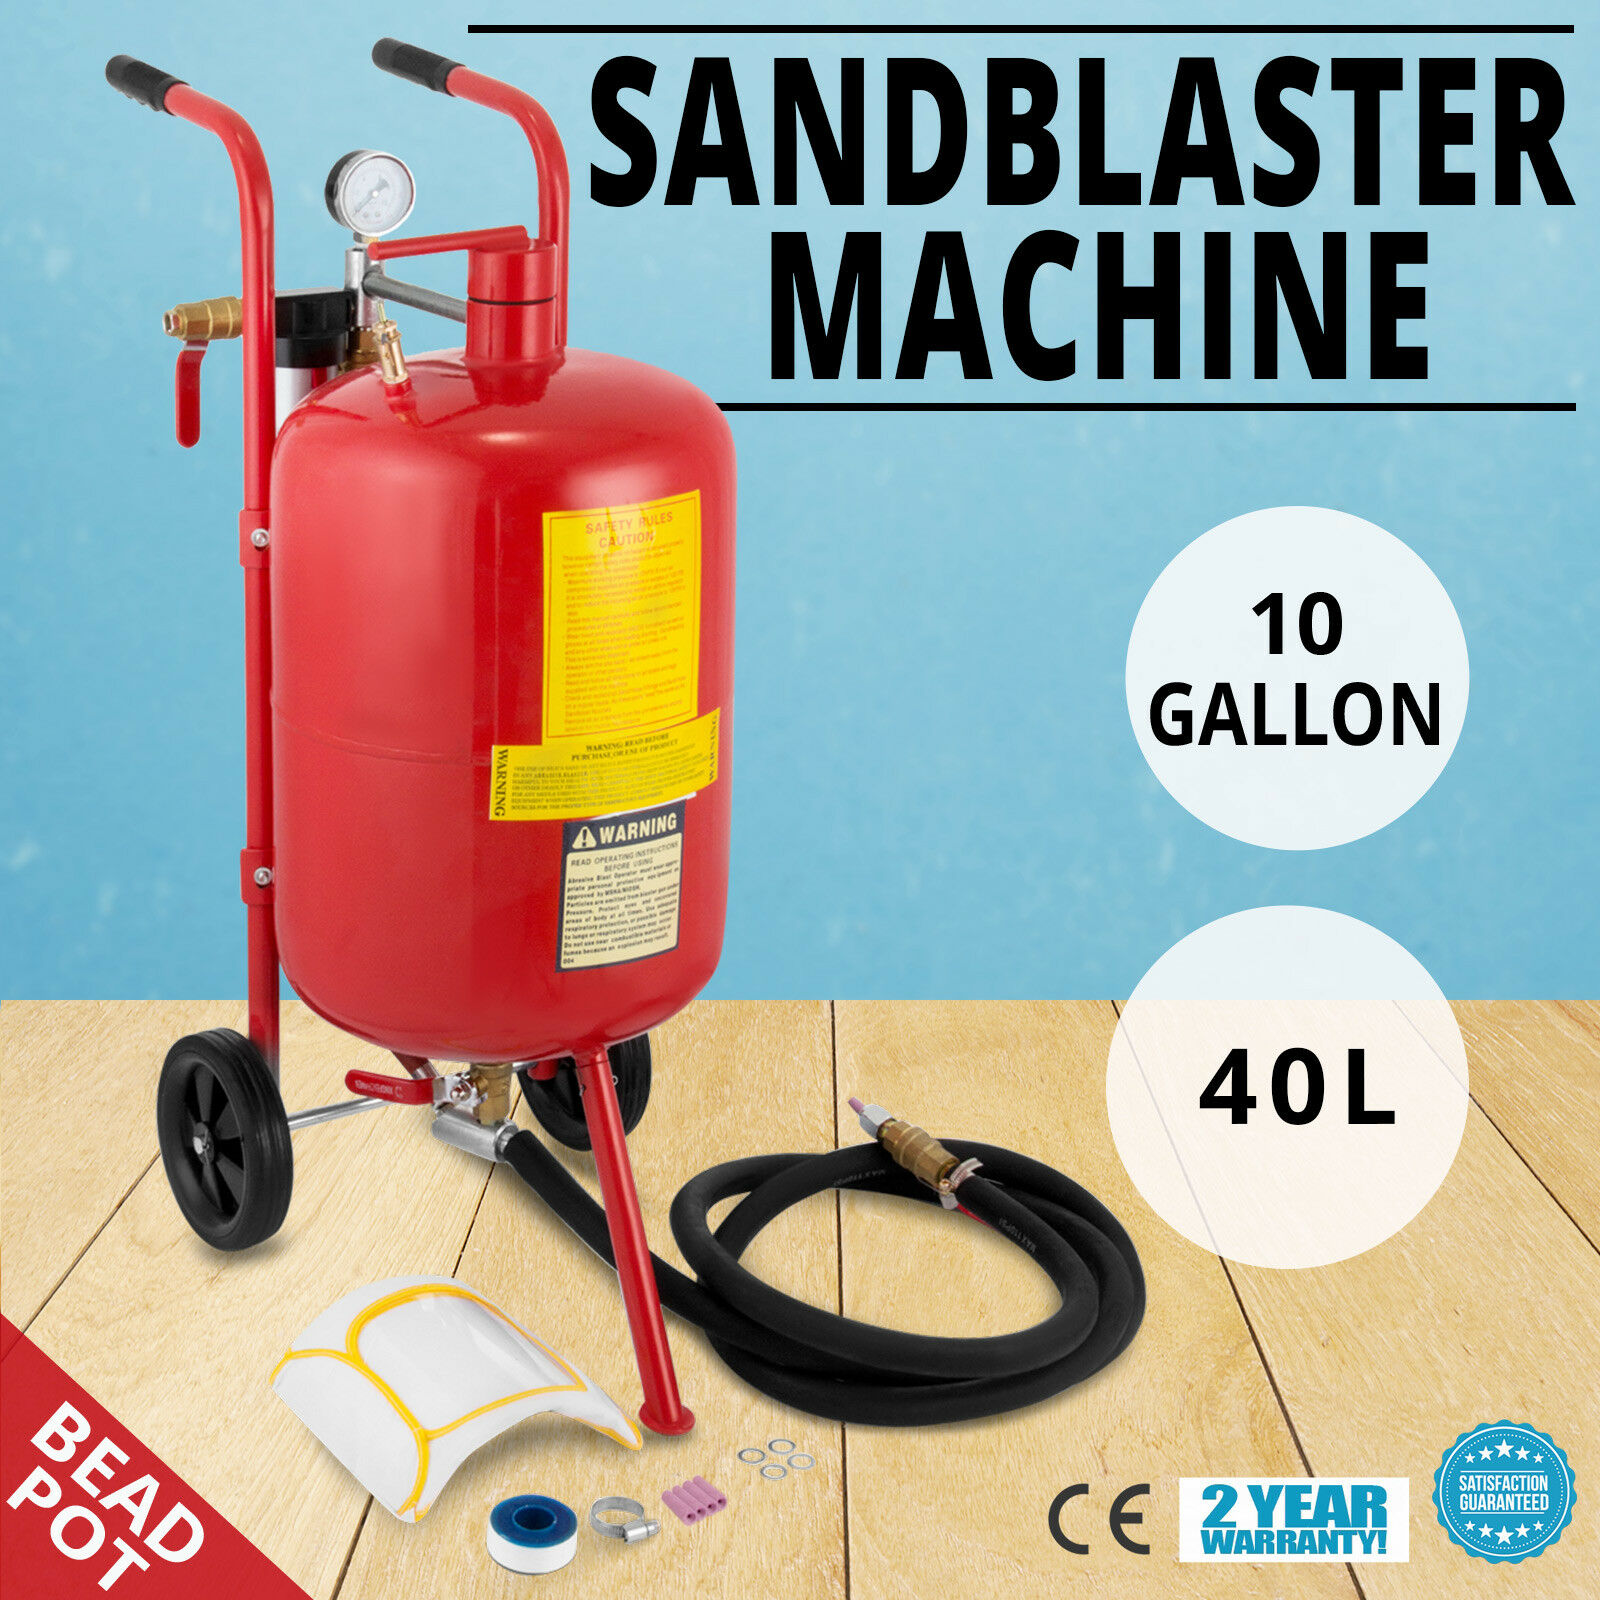 VEVOR 10 Gallon/40L Sandblaster Bead Pot Sand Blaster Grit Blasting Blast Sandblasting